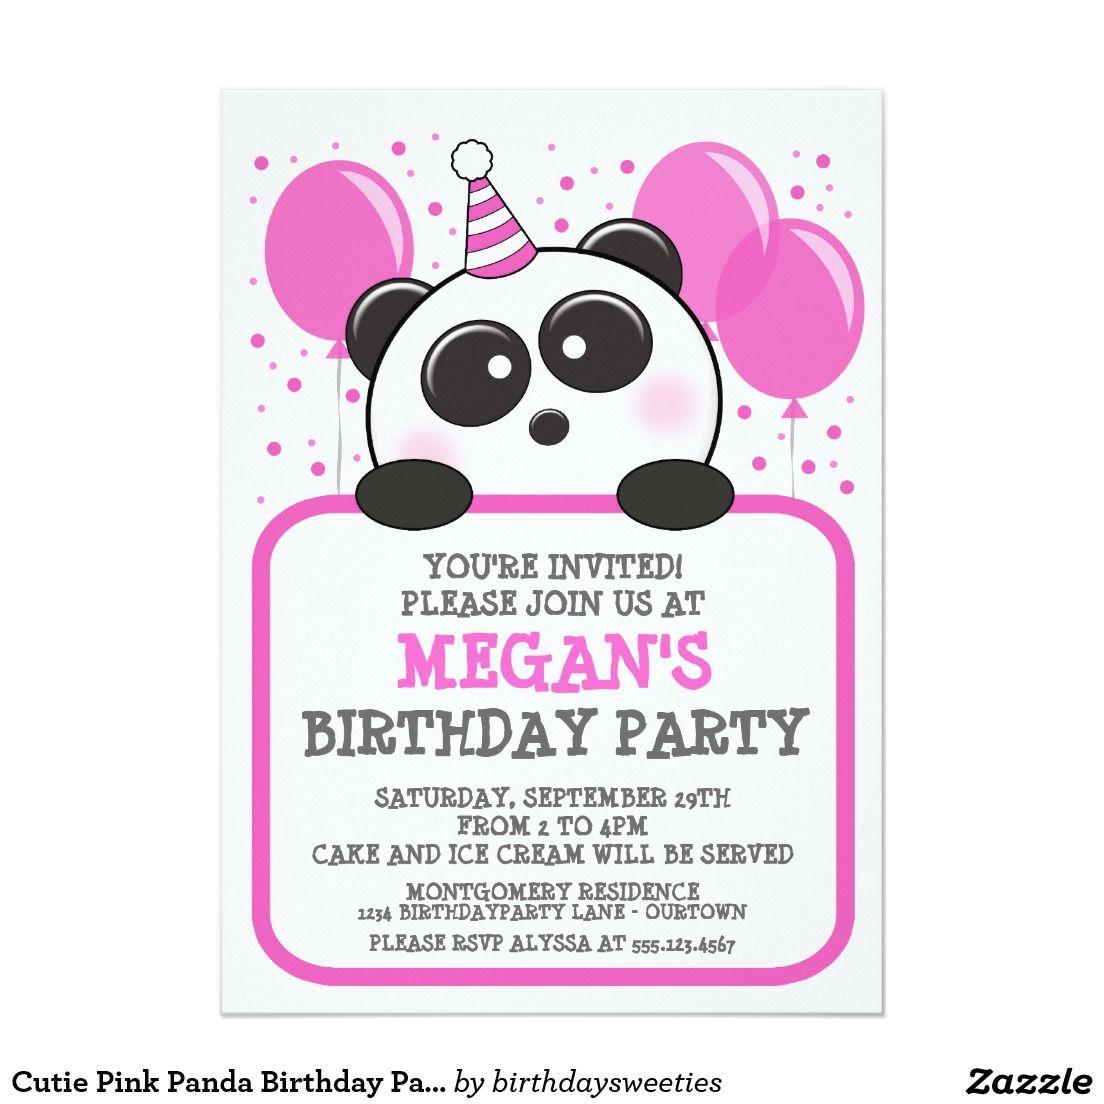 Cutie Pink Panda Birthday Party Invitations 5\